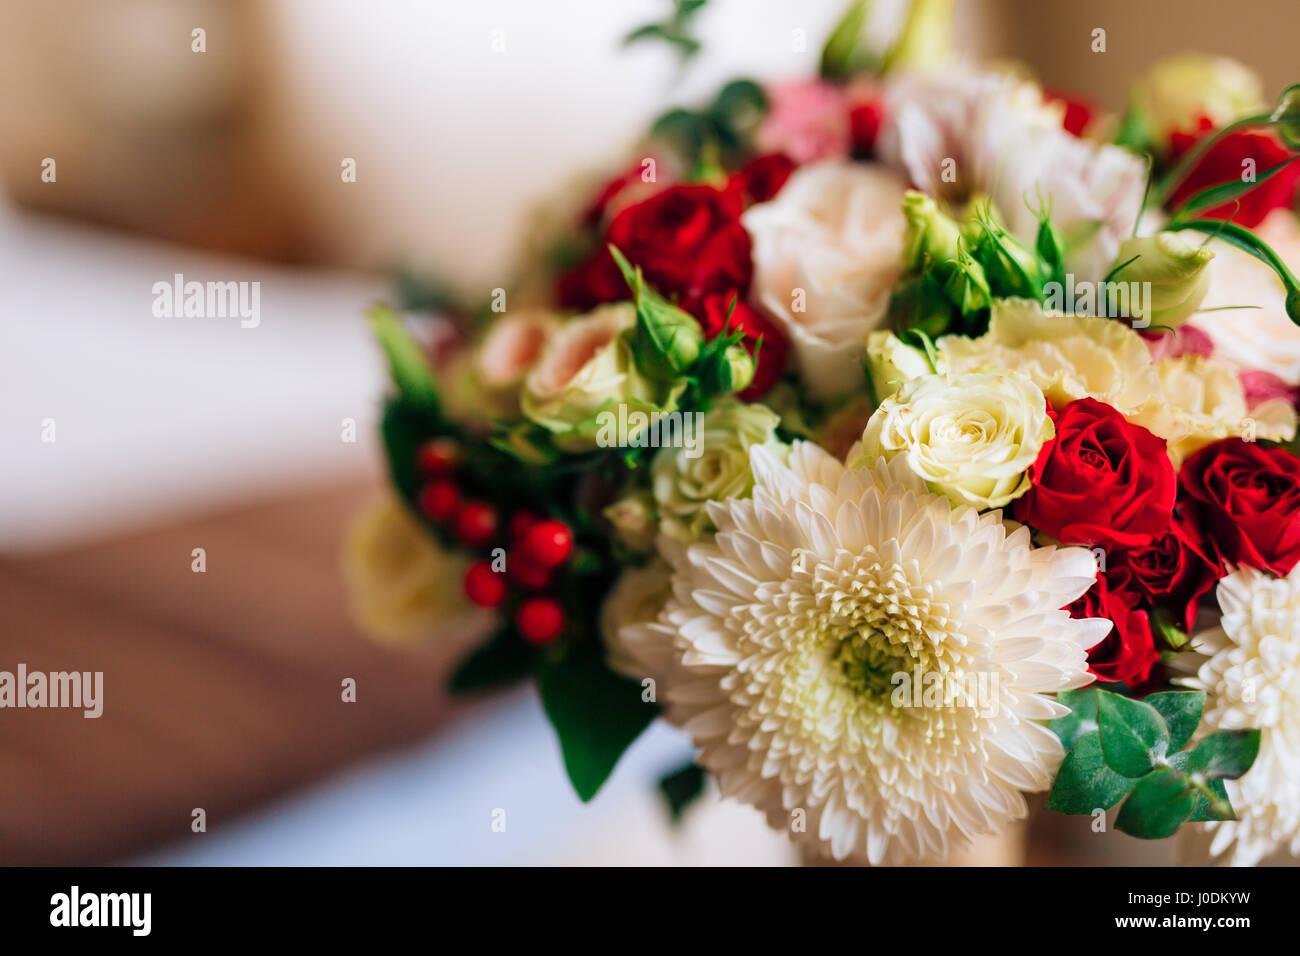 Wedding Bridal Bouquet Of Roses Chrysanthemums Eucalyptus Baby Stock Photo Alamy